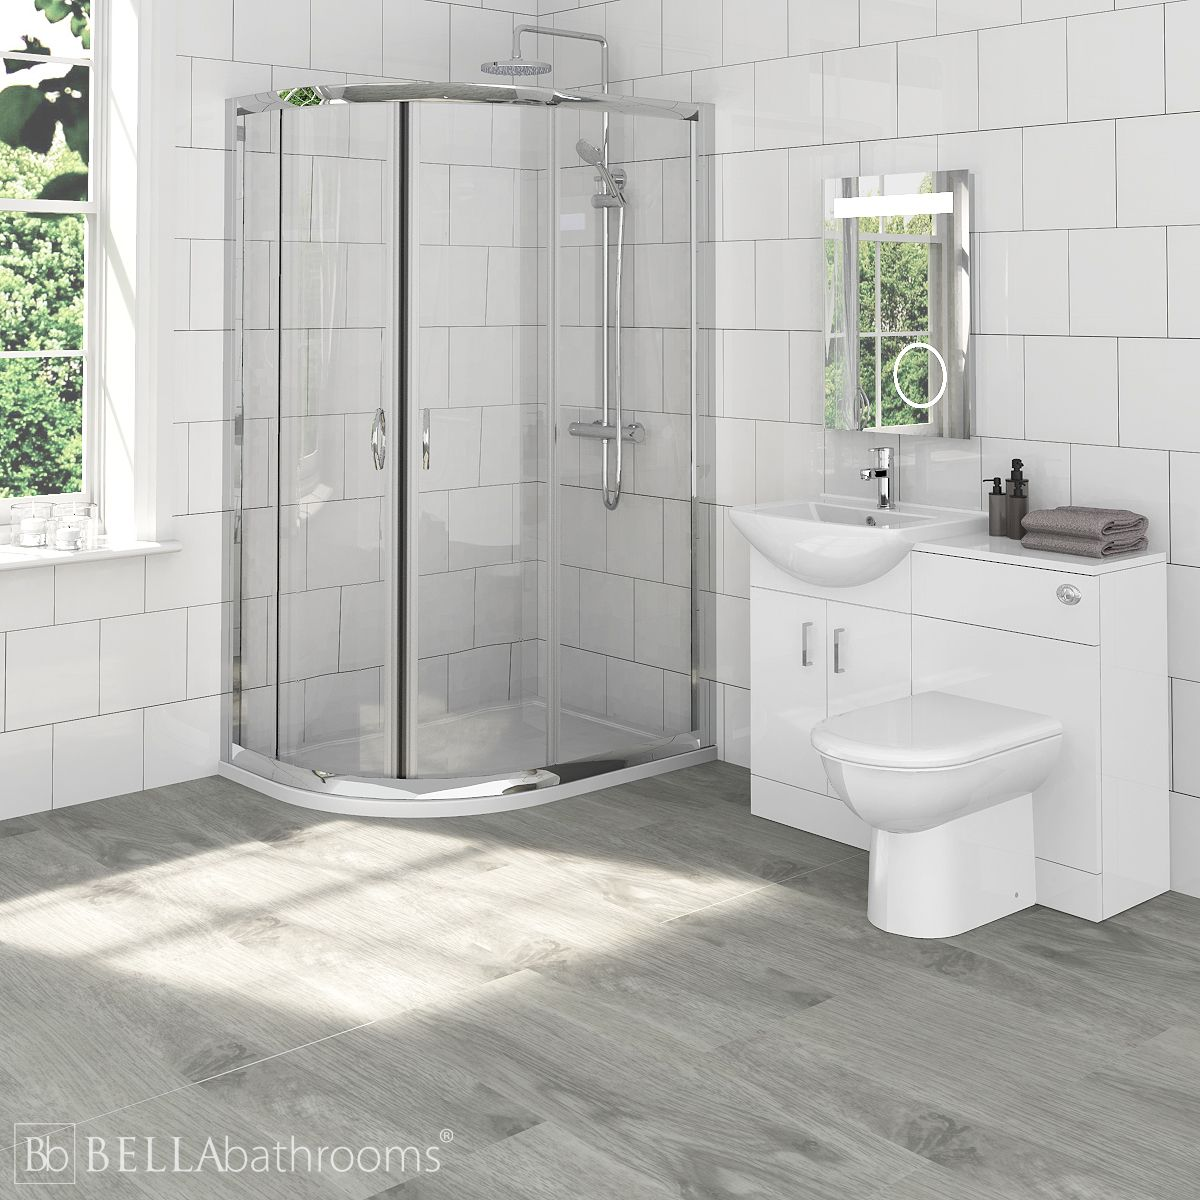 Madison Bathroom Furniture Pack with Ella Offset Quadrant Shower Enclosure